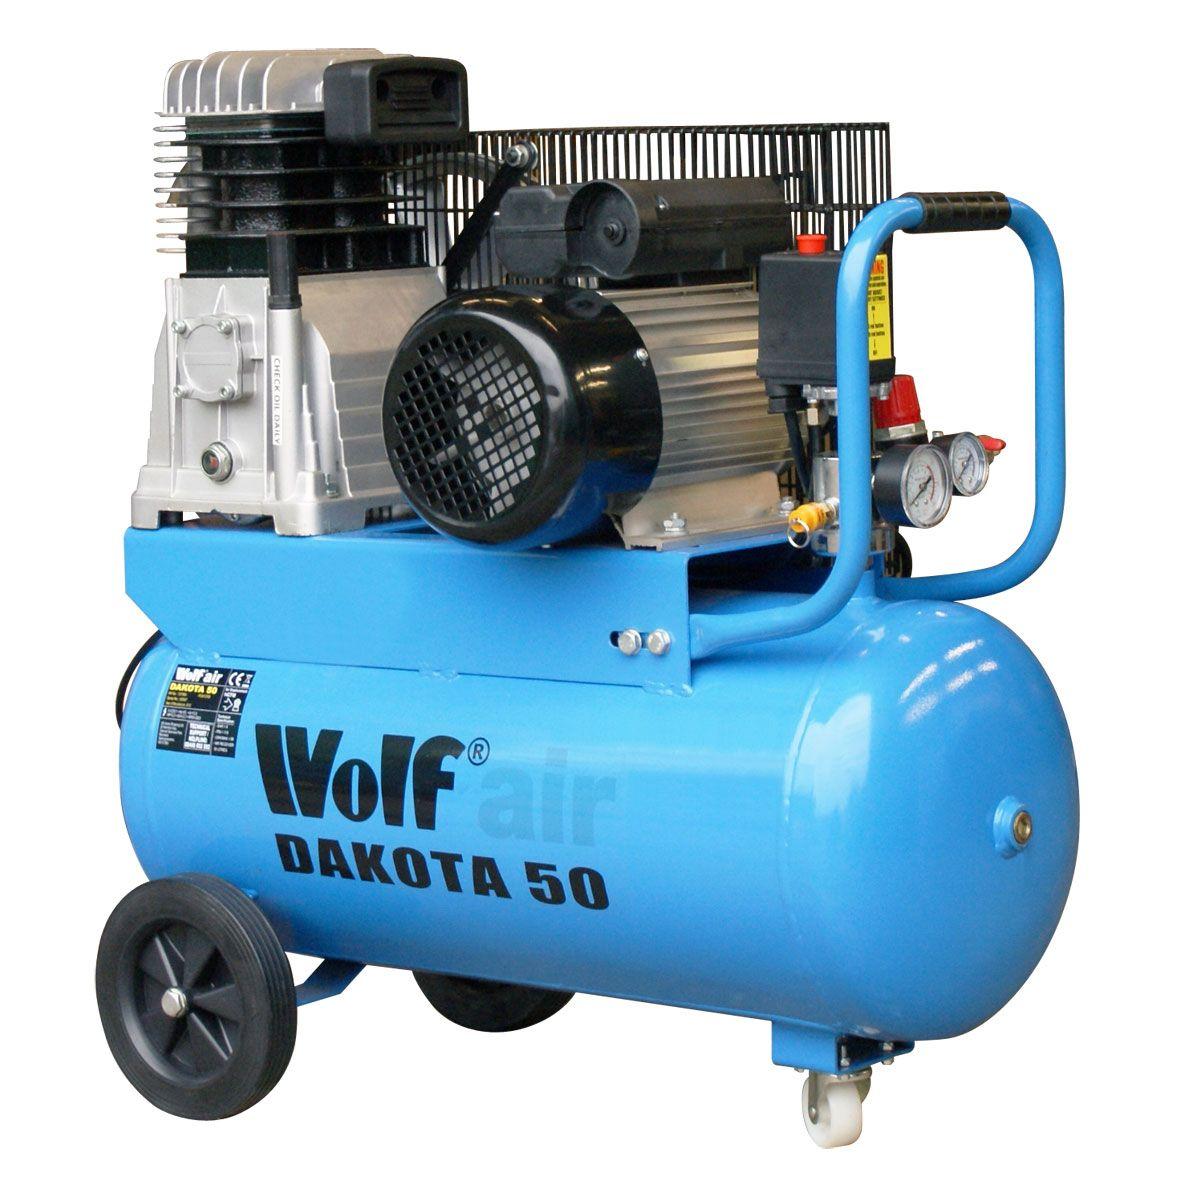 Wolf Dakota 50L Air Compressor. This 50L has been